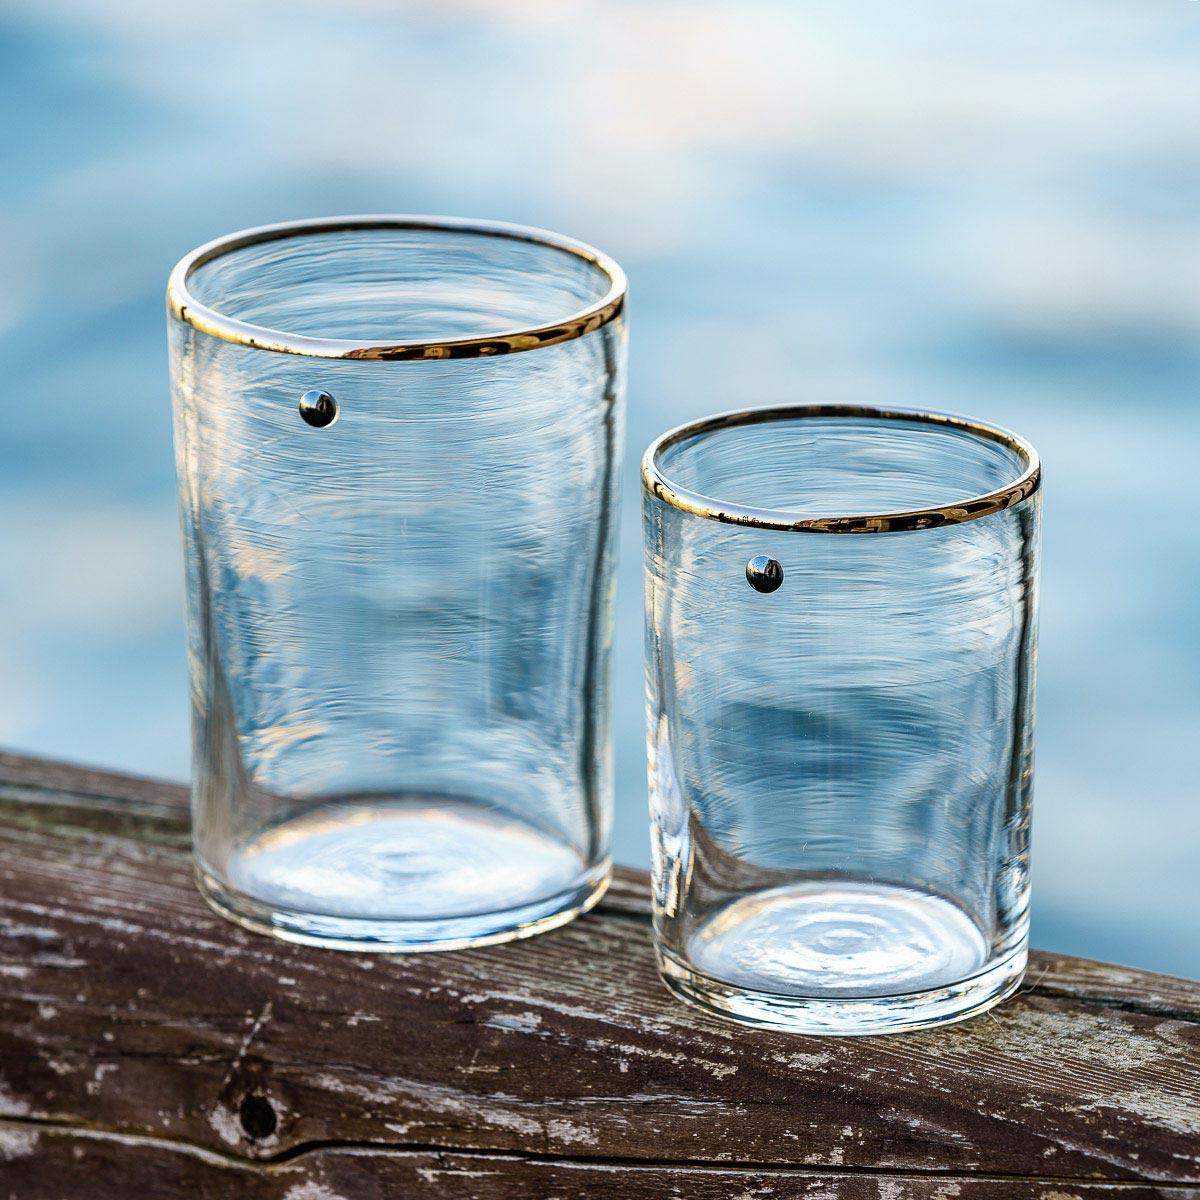 isabelle-wine-glass-murano-giberto-lux-luxury-crystal-stone-platinum